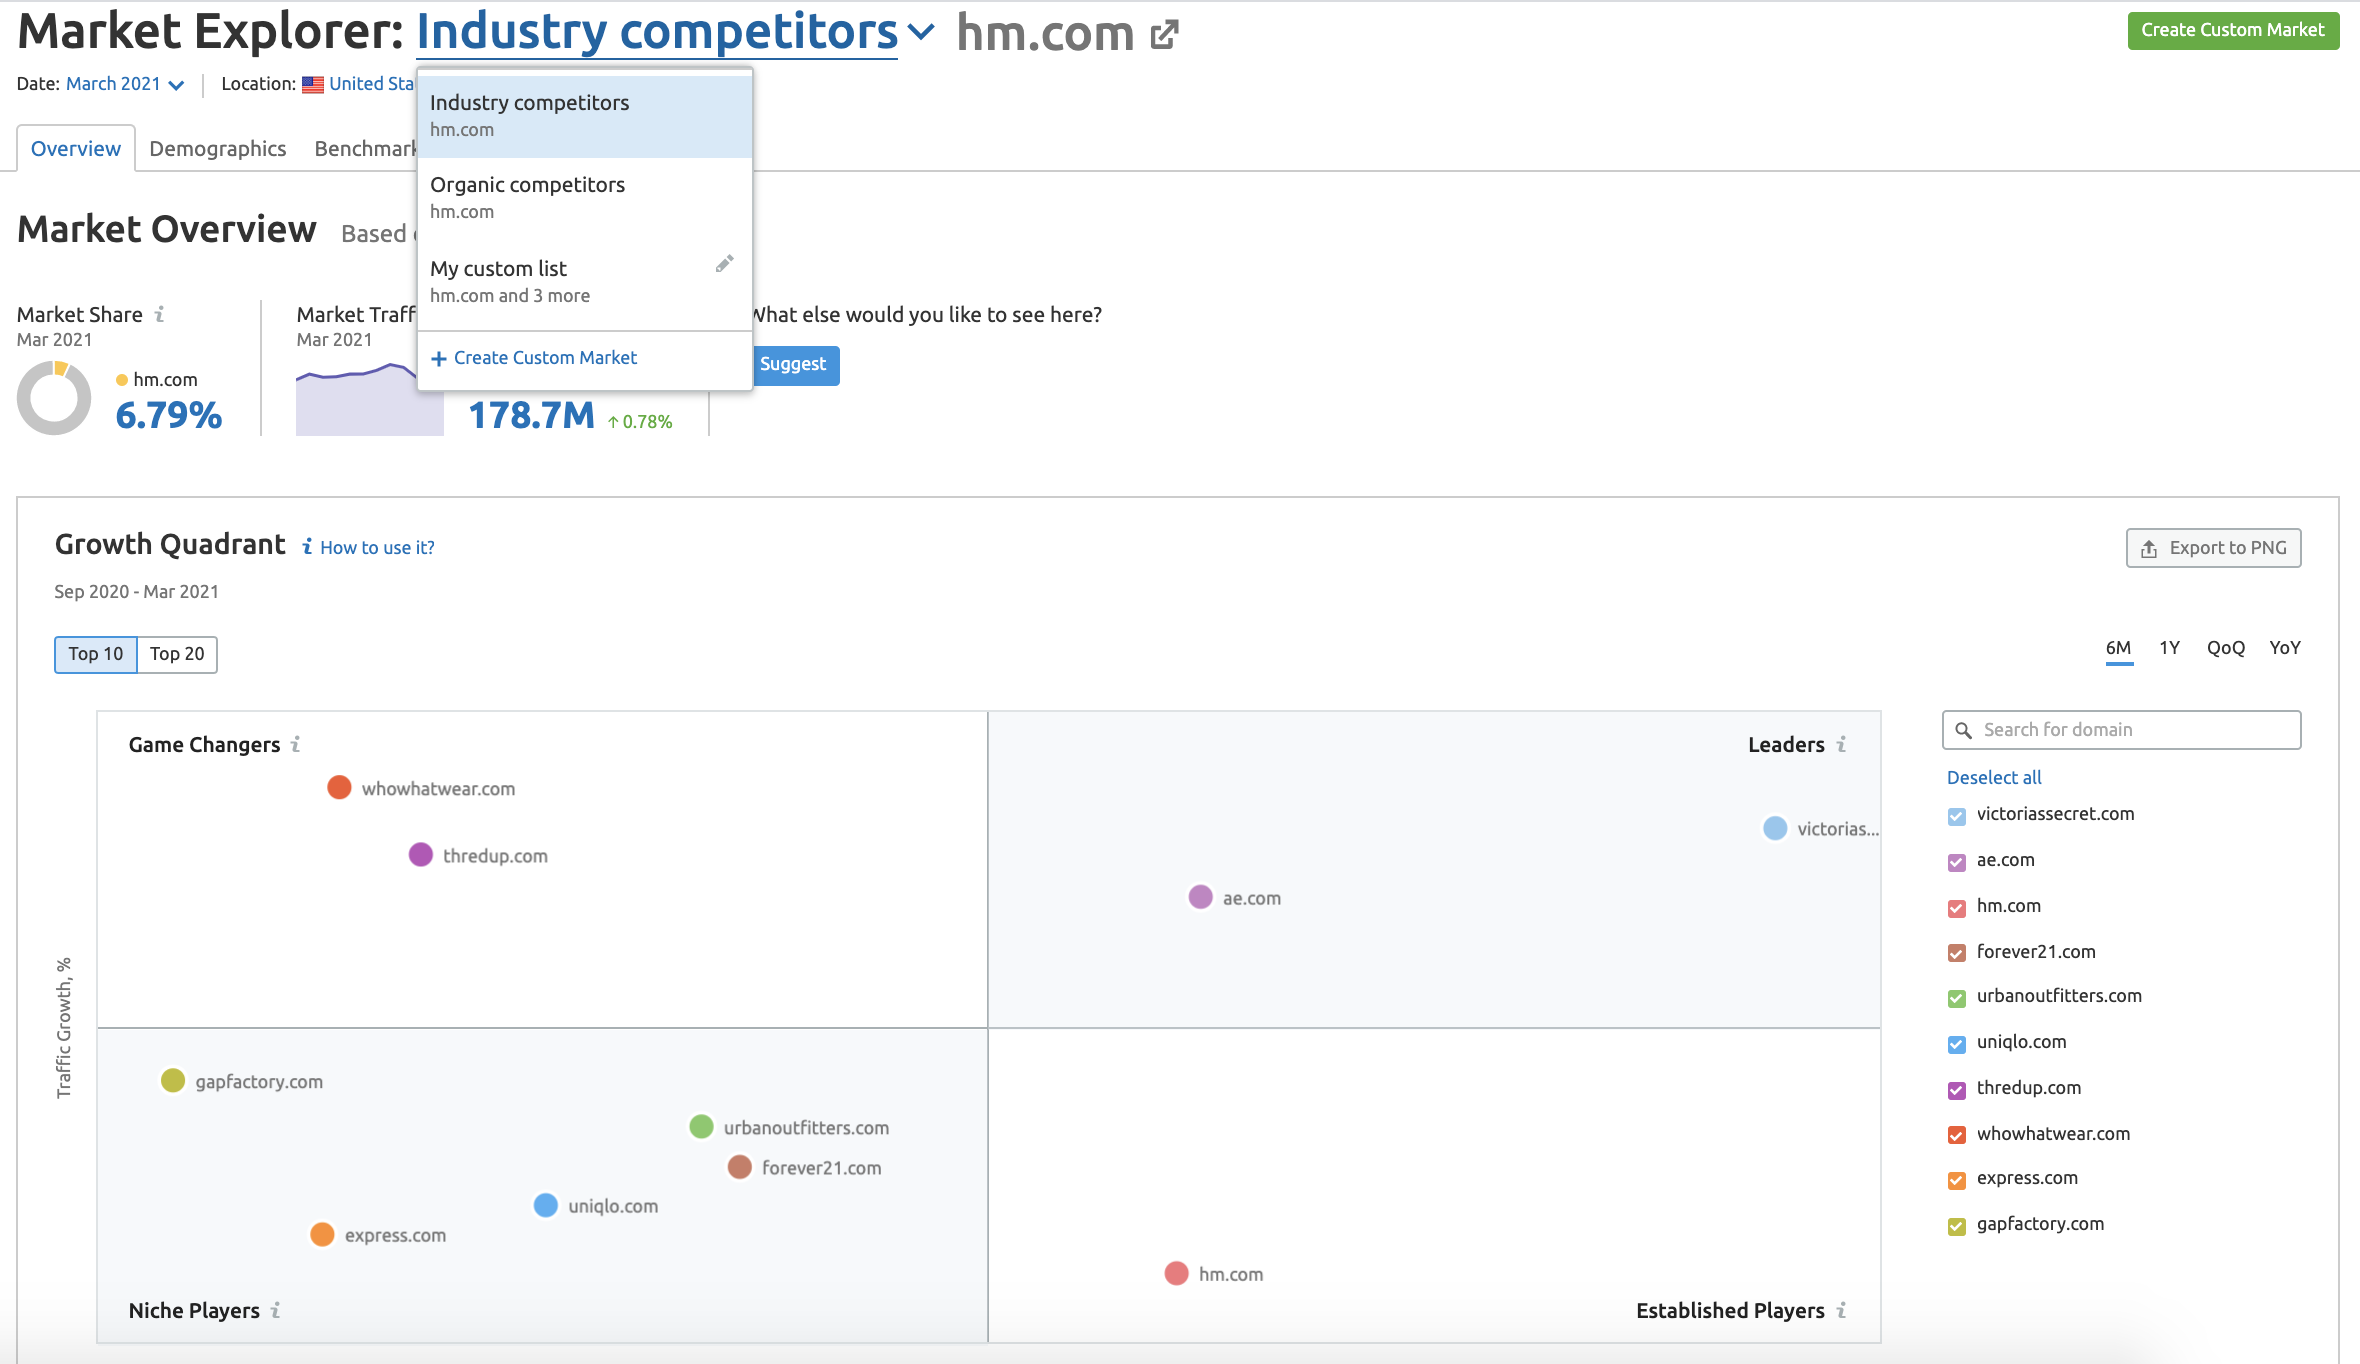 Market Explorer Industry competitors